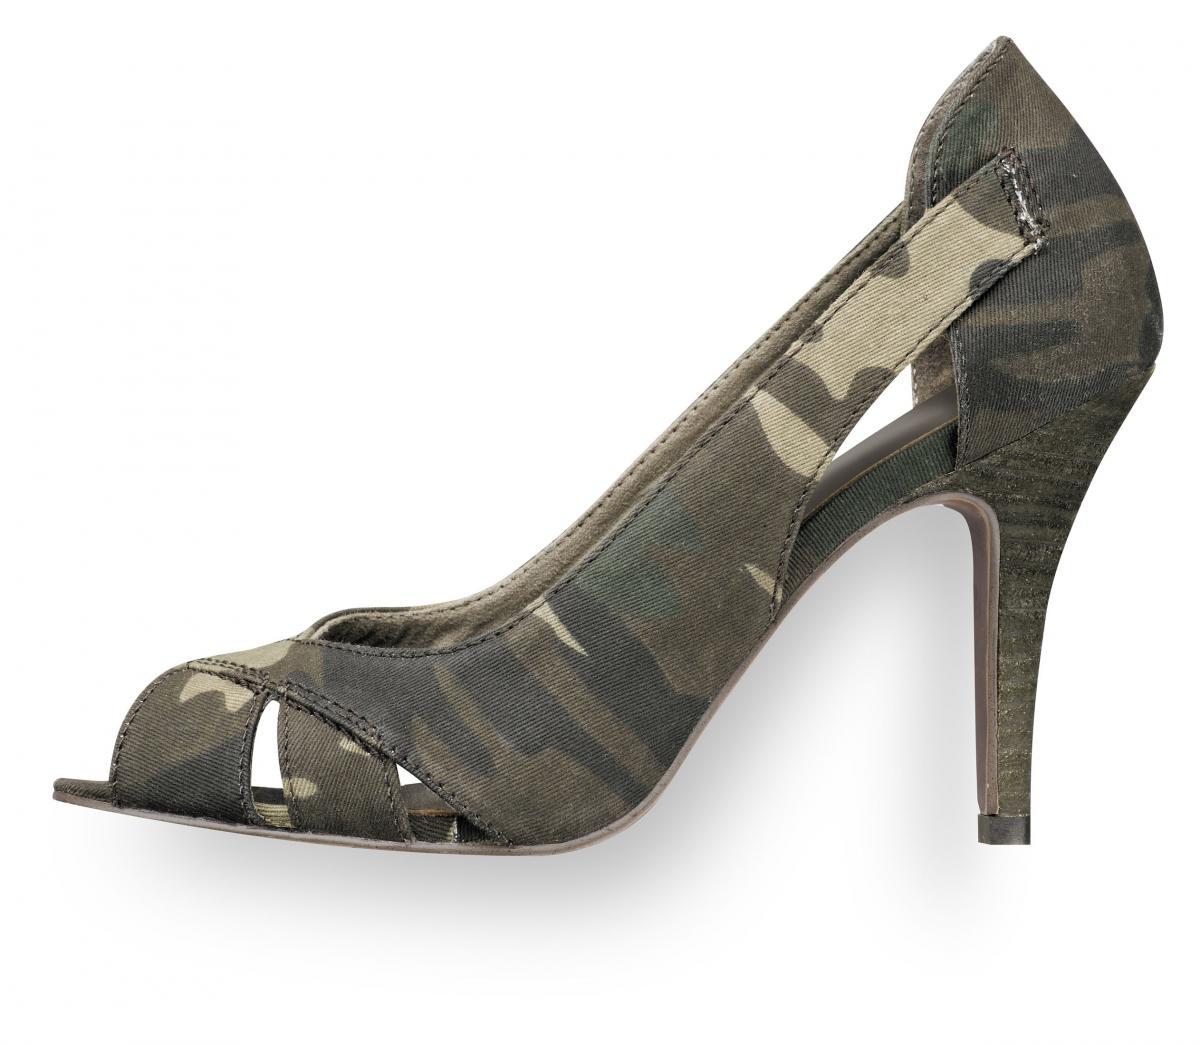 khaki pantofle moro Tamaris na szpilce - kolekcja wiosenna